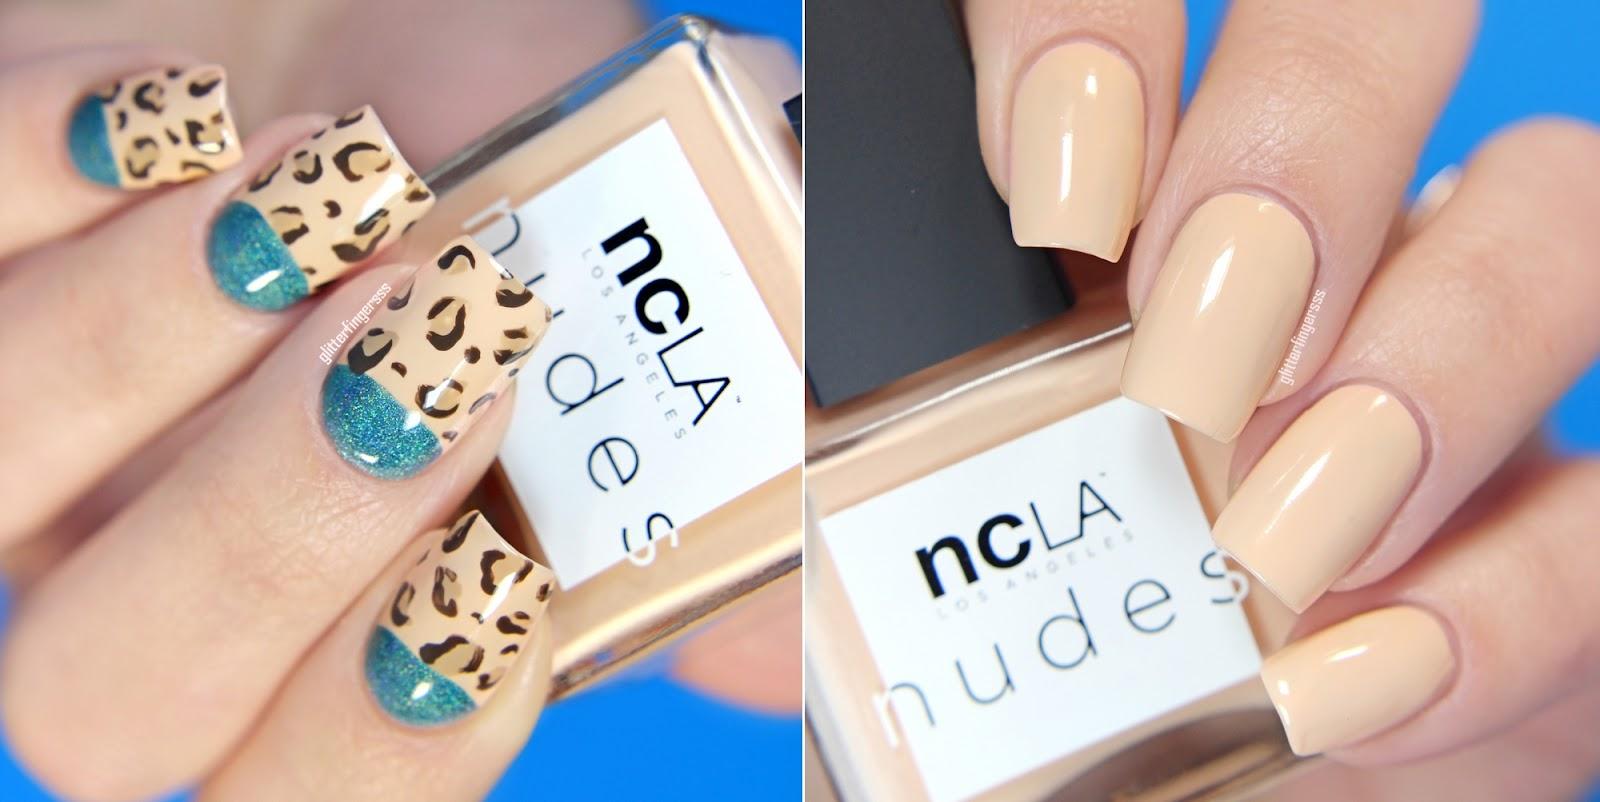 NCLA Wants to Make Nail Polish for Men Happen